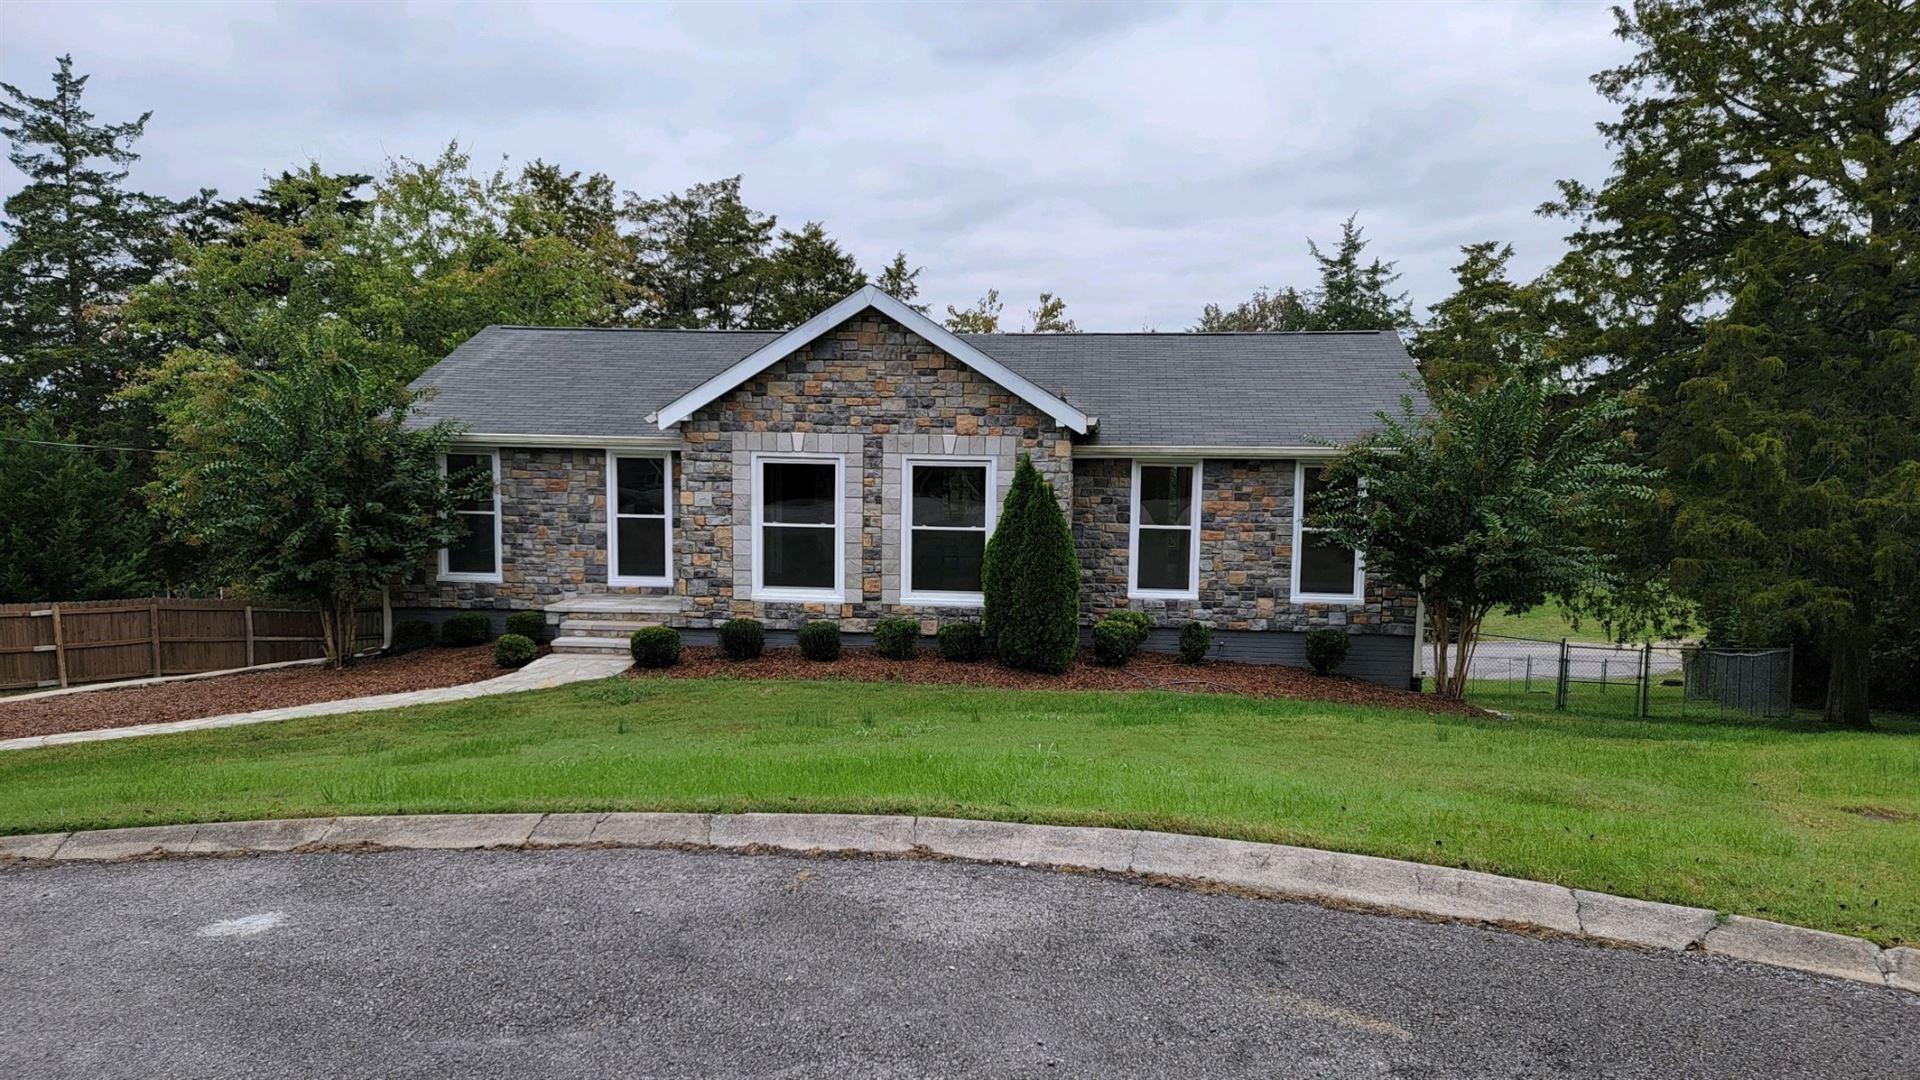 103 Pine Branch Trl, Hendersonville, TN 37075 - MLS#: 2302583